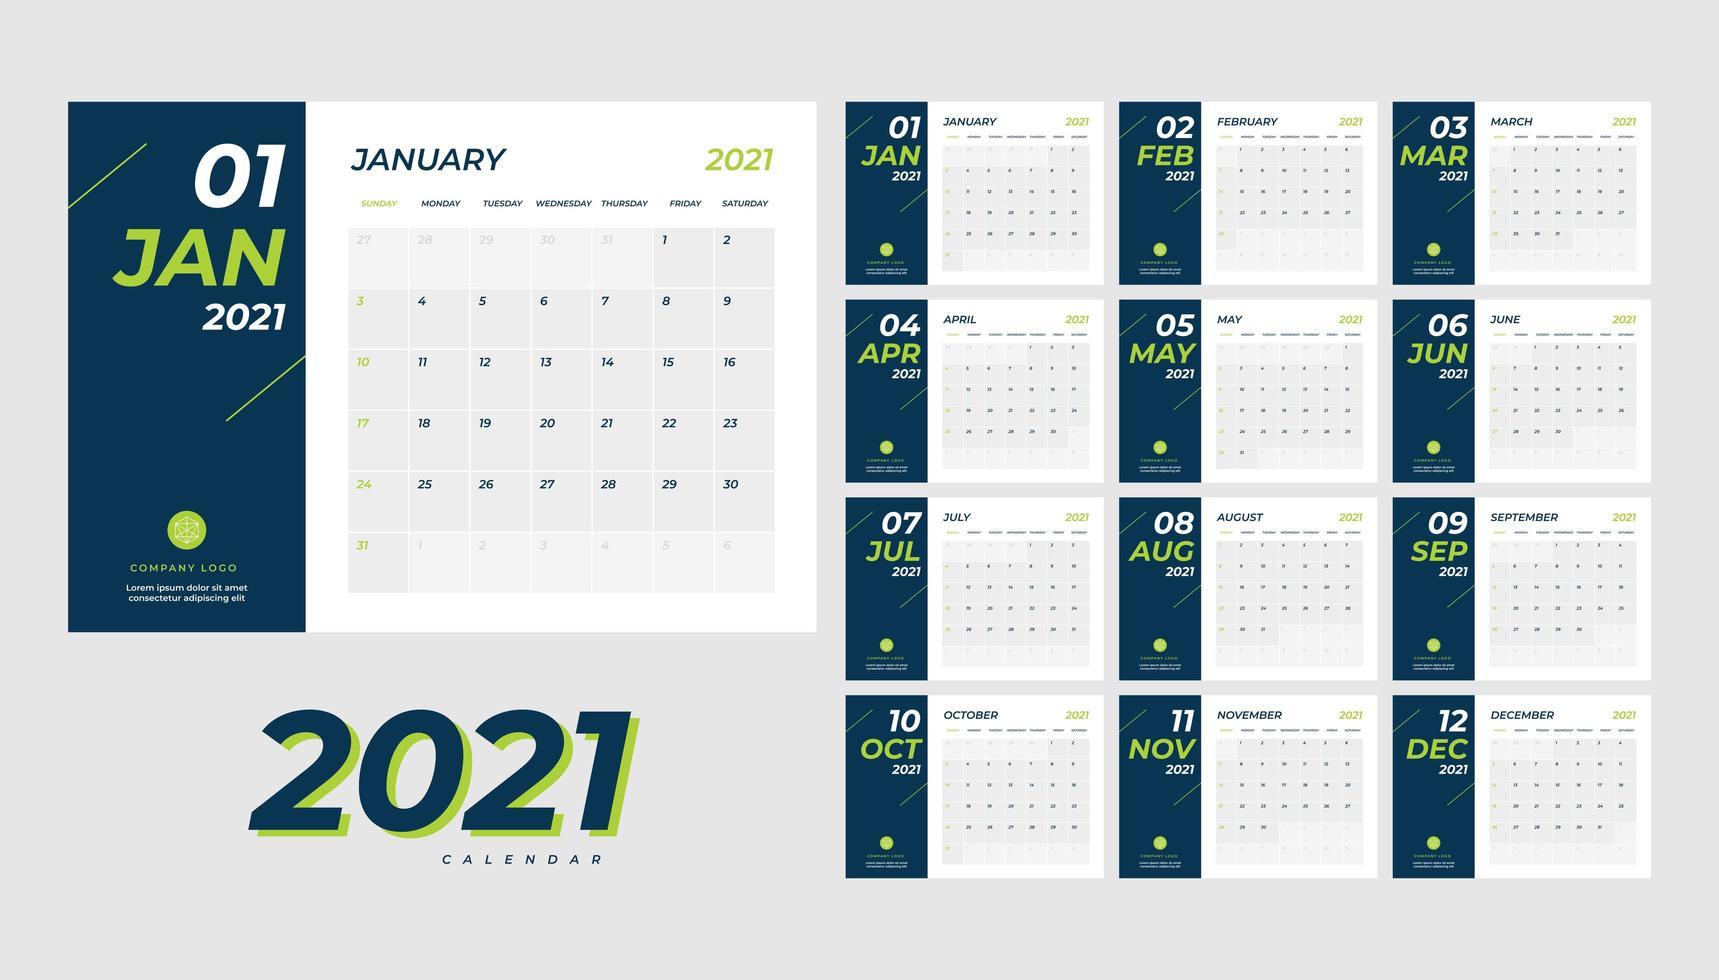 calendario de escritorio mensual año 2021 vector